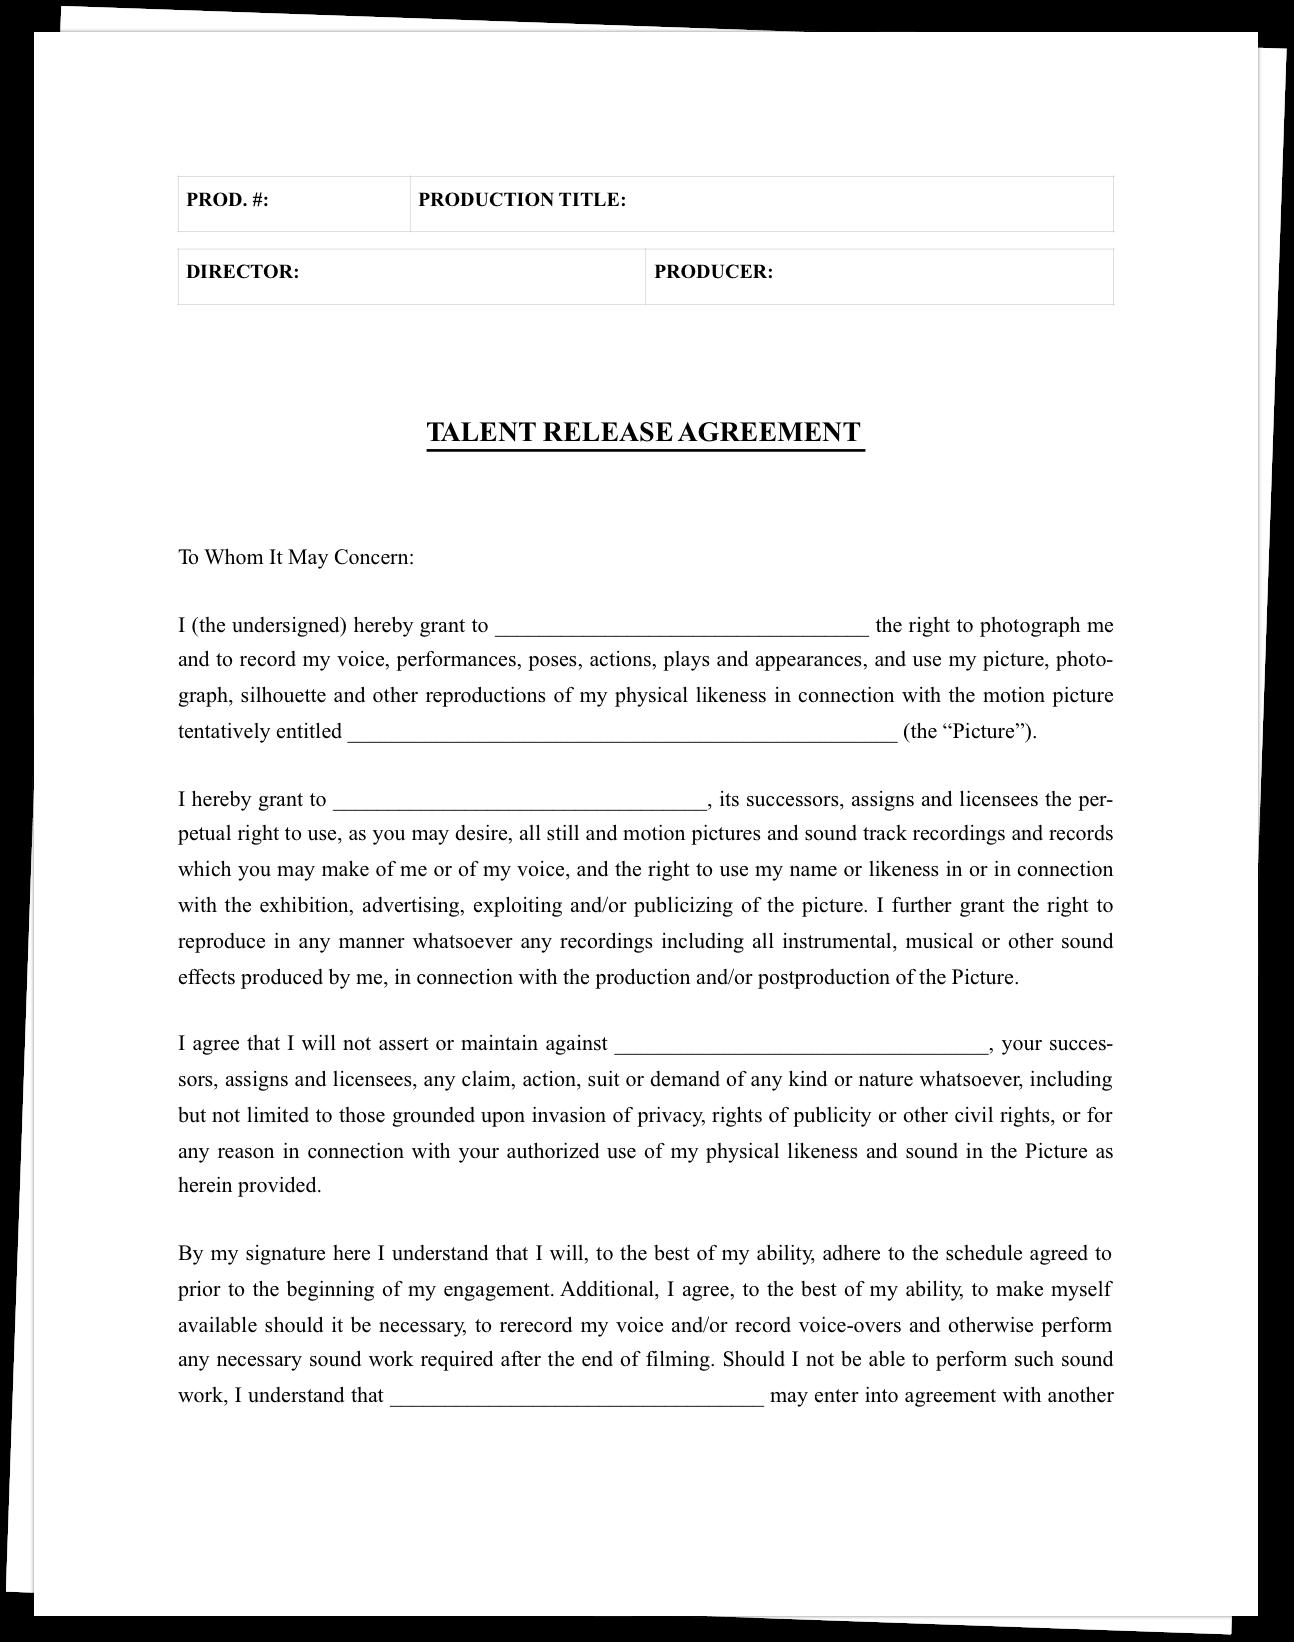 Free Film Actor Release Form Template - StudioBinder